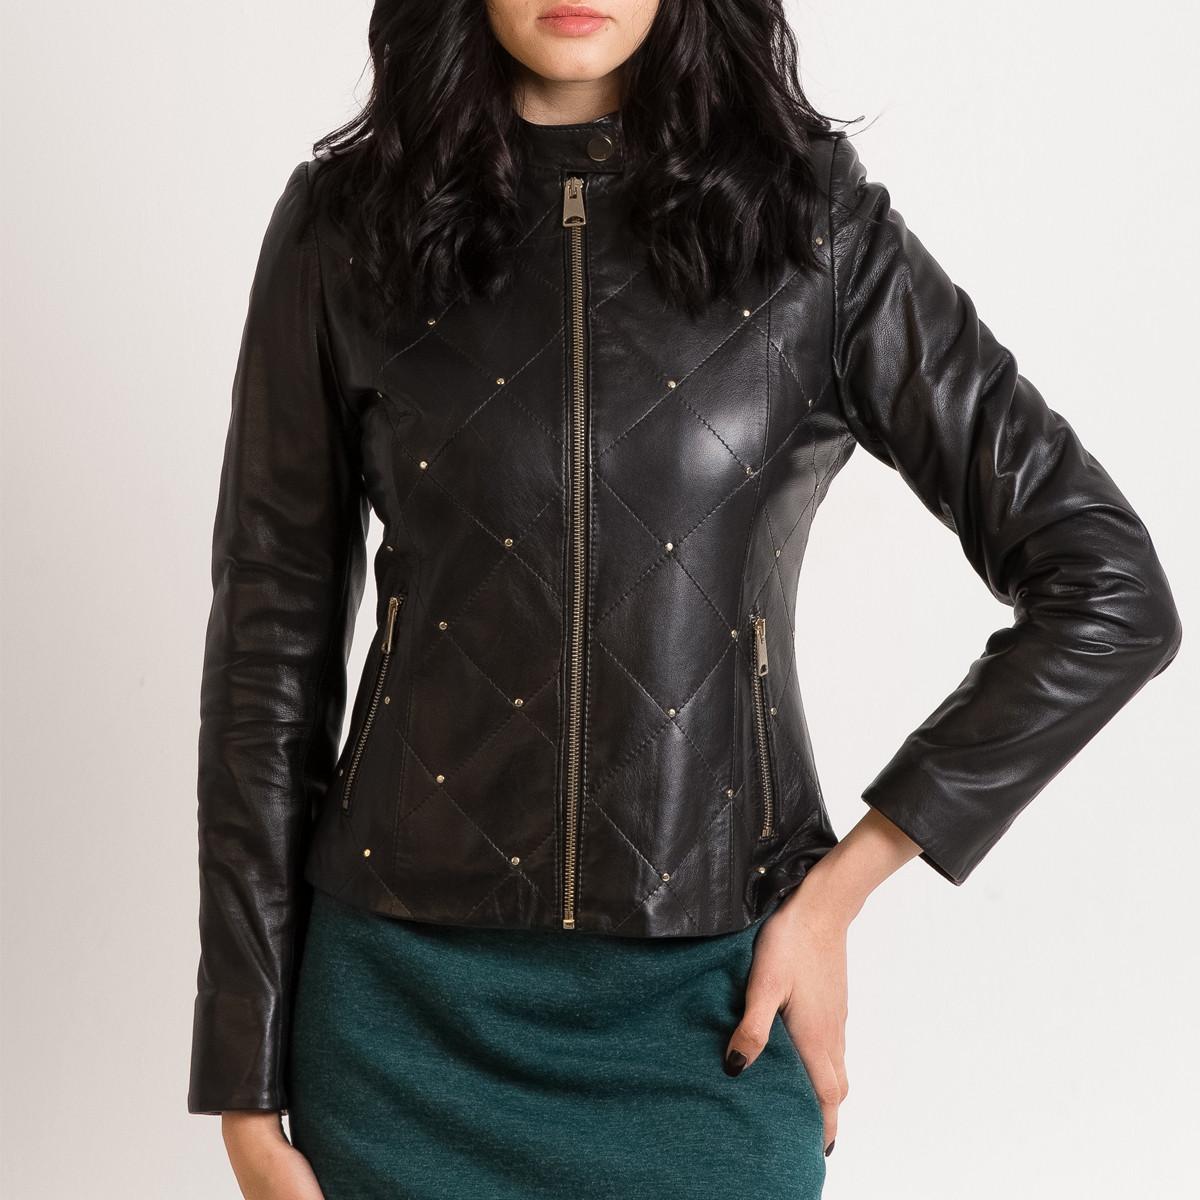 Кожаная куртка VK черная стеганая (Арт. NIK201)